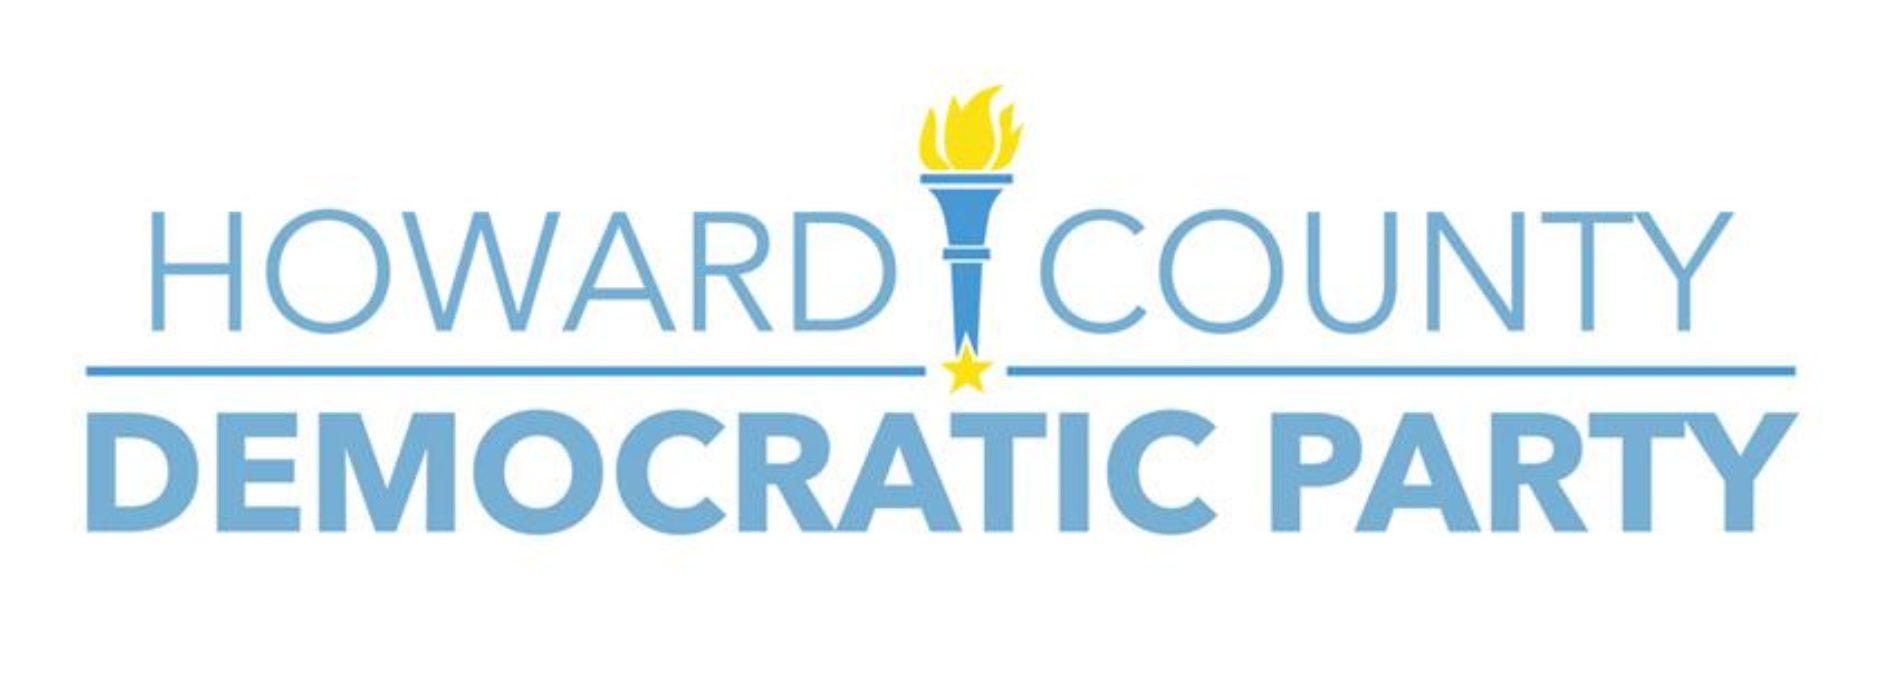 Howard County Democratic Party Response to Kokomo Common Councillor Jones' resignation